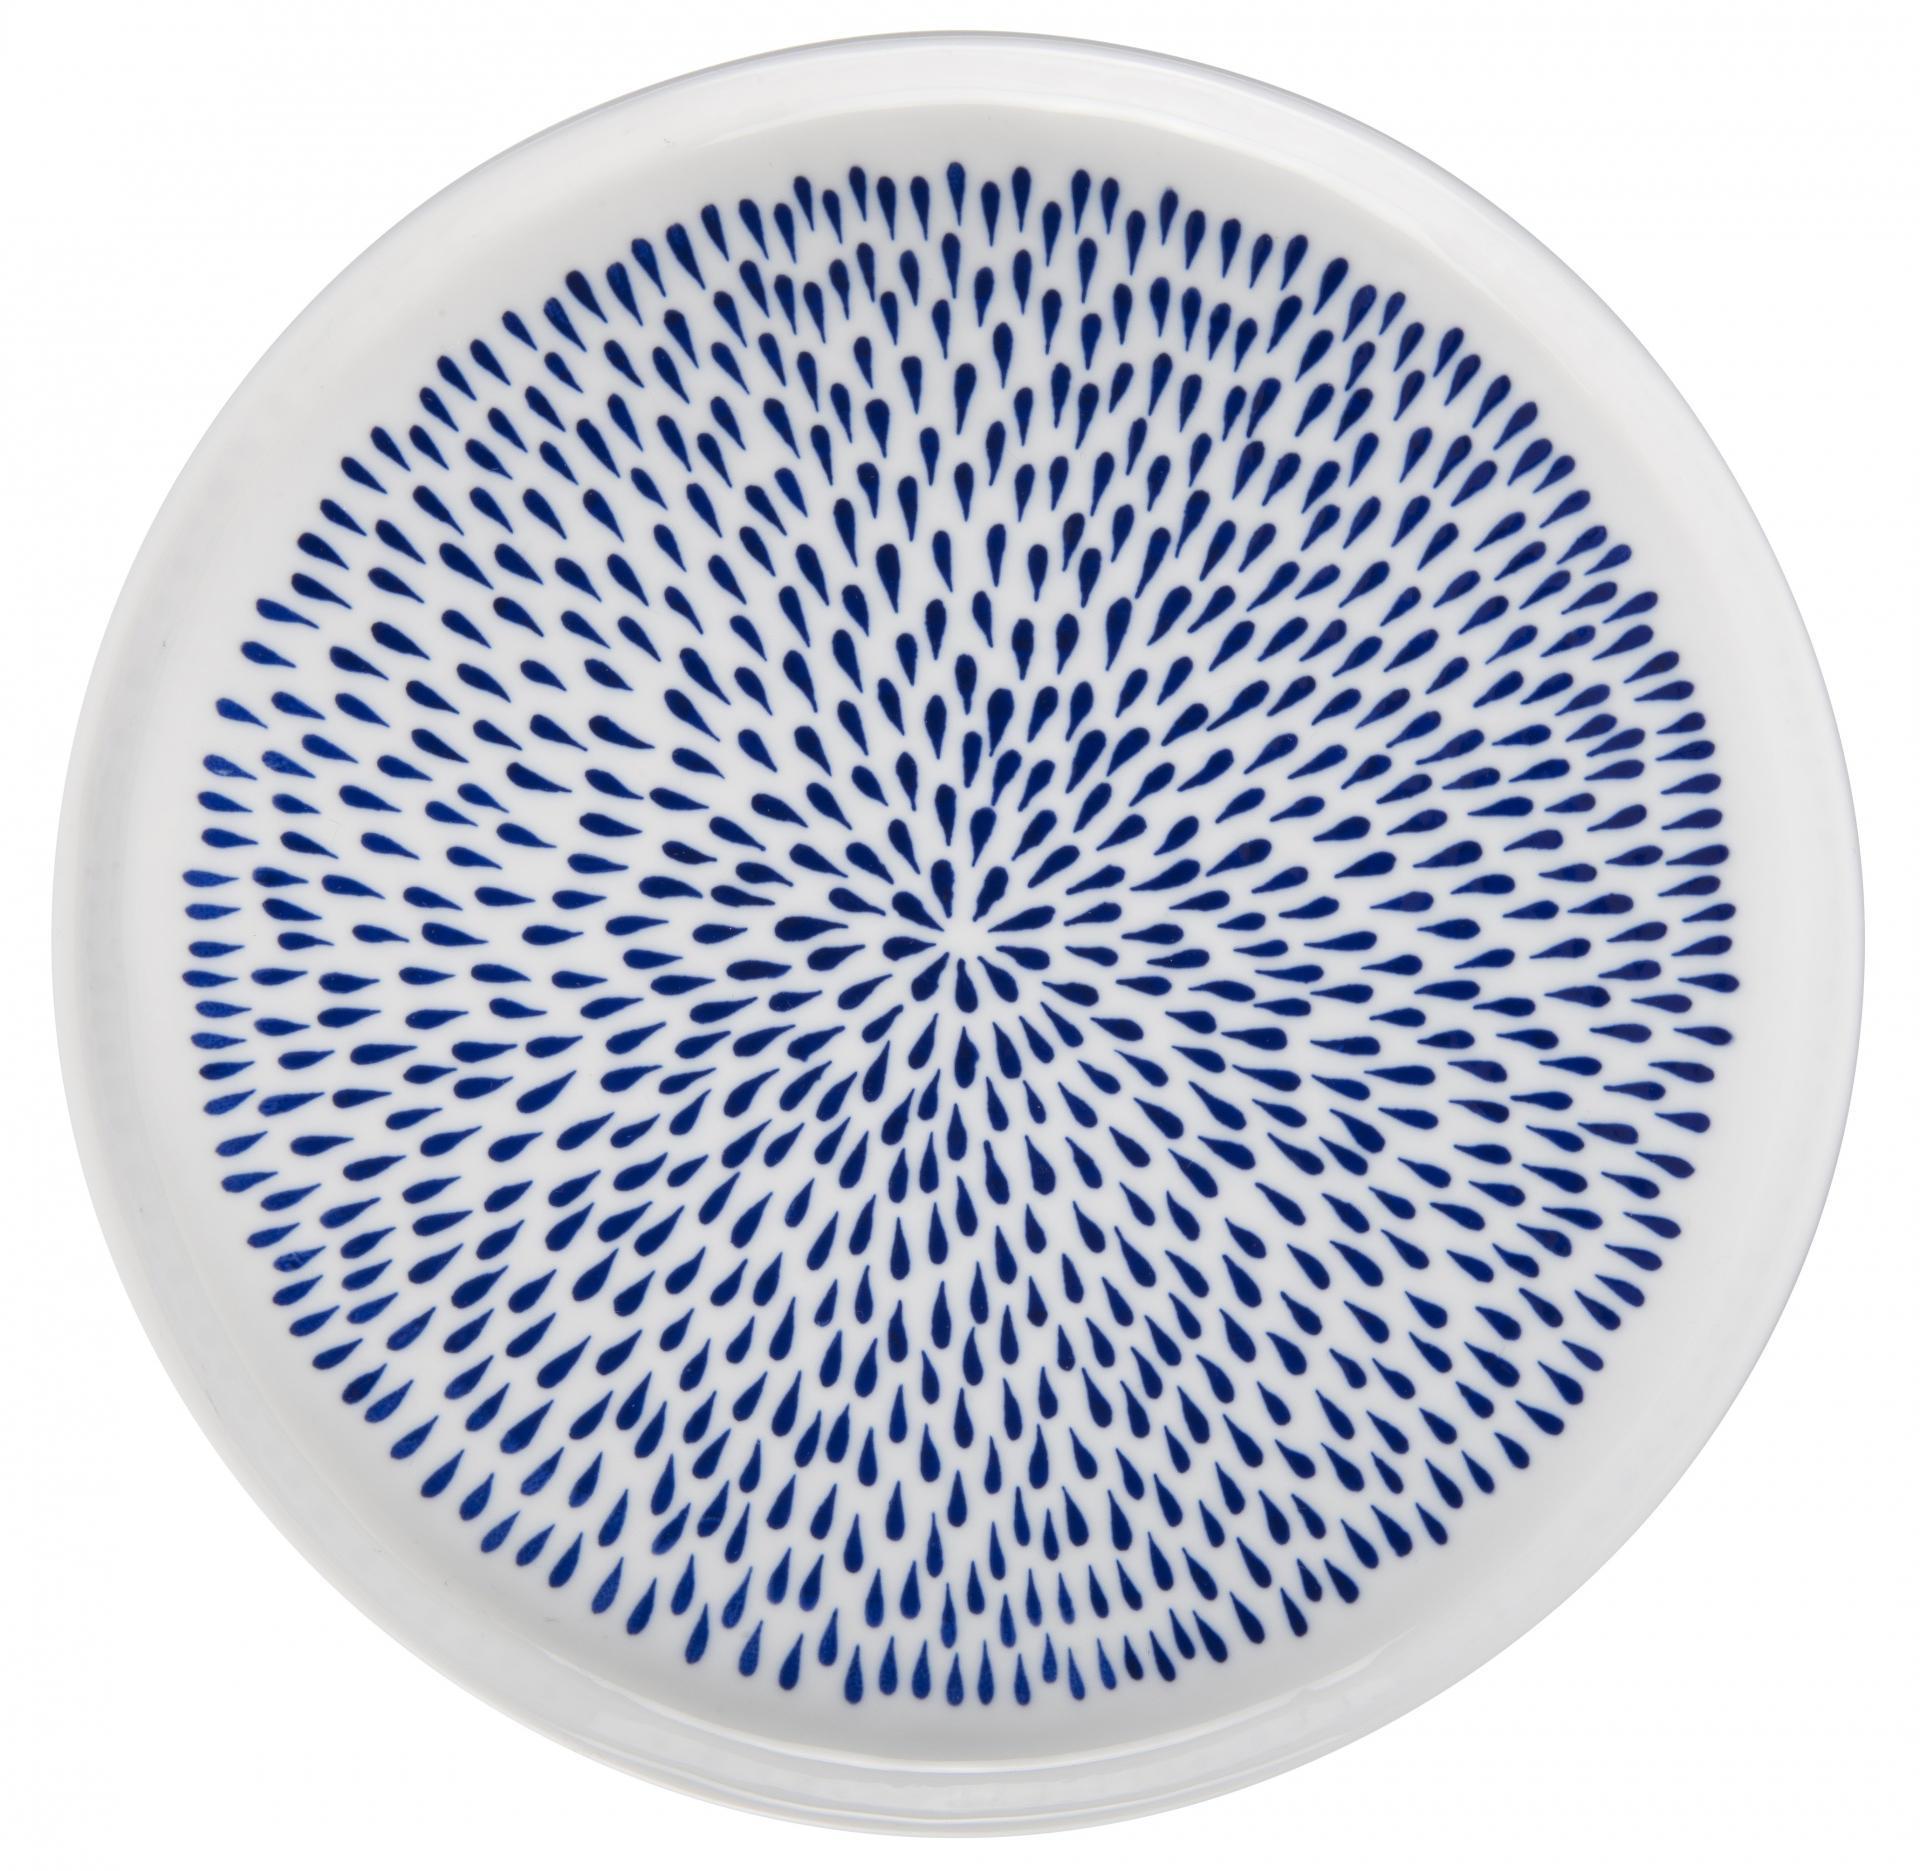 IB LAURSEN Porcelánový obědový talíř Delicate Blue, modrá barva, bílá barva, porcelán